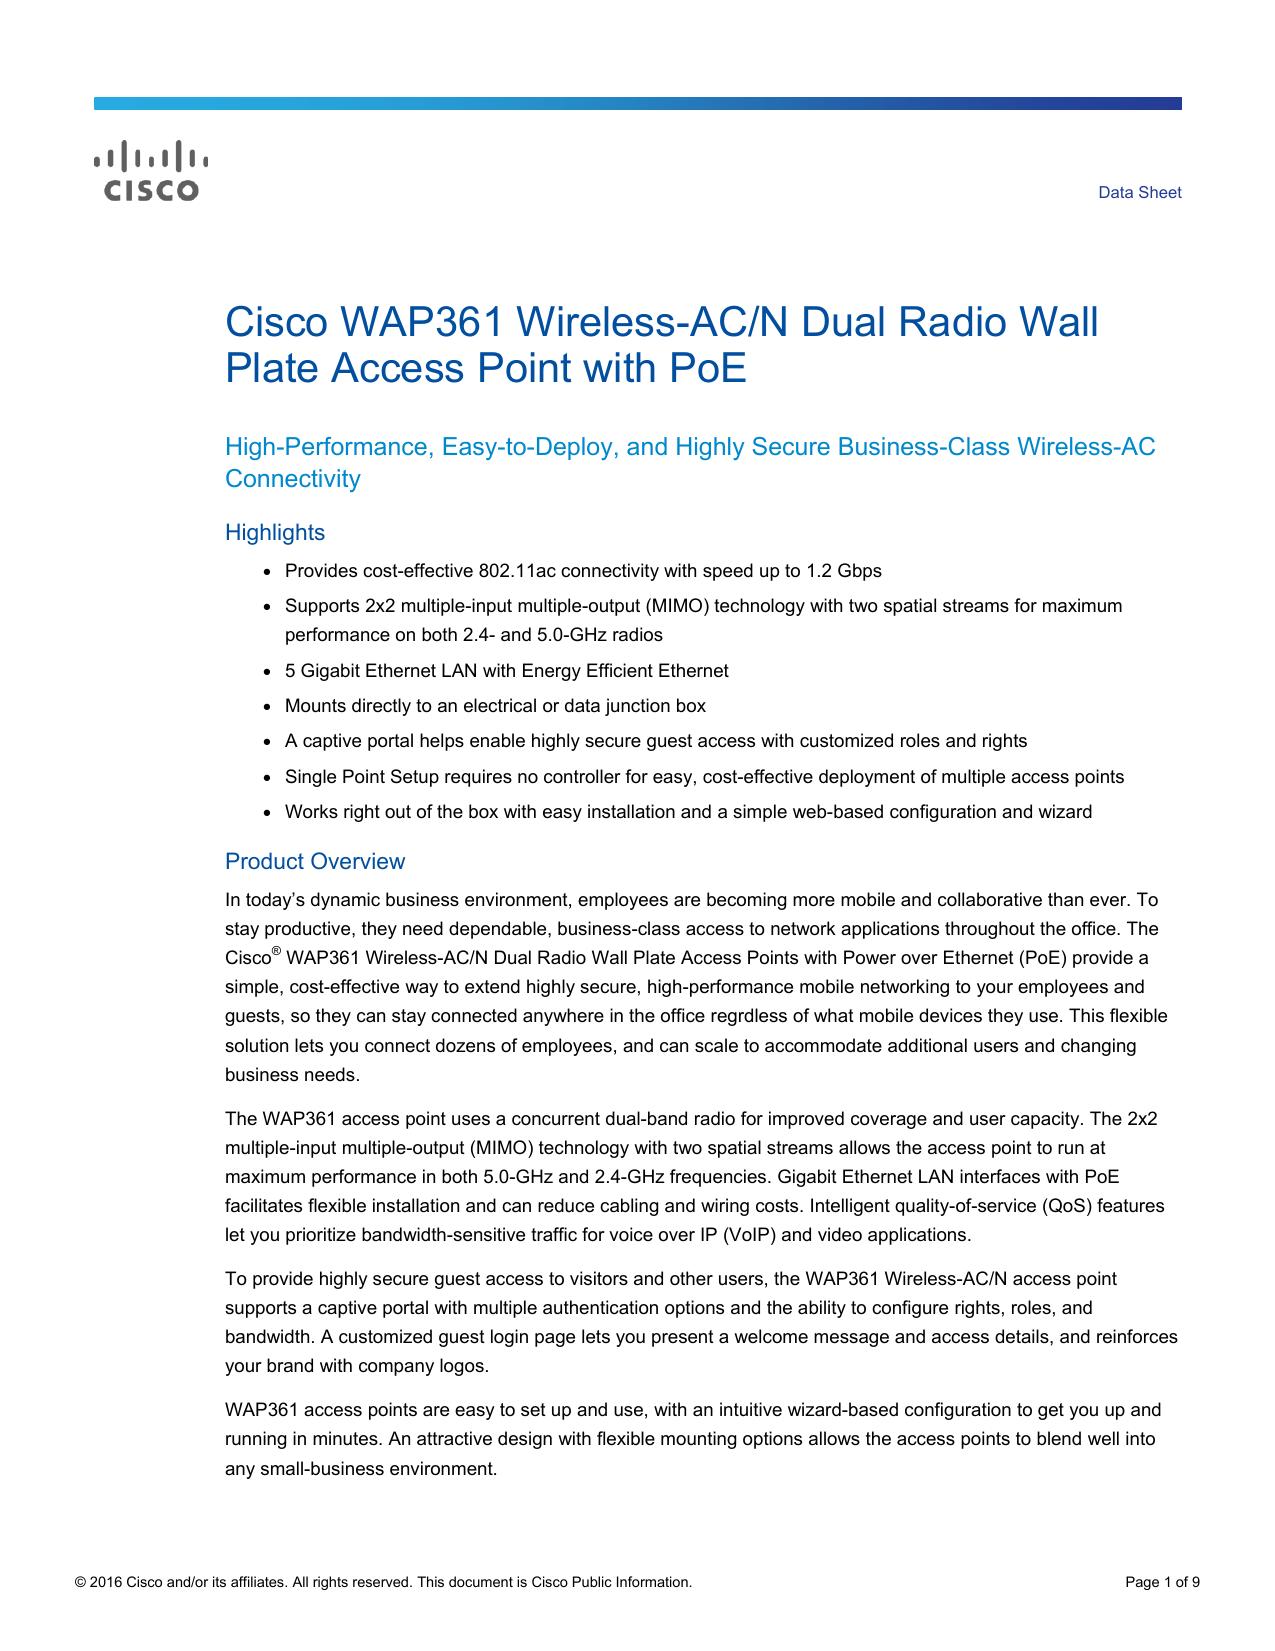 Cisco WAP361 Wireless-AC/N Dual Radio Wall Plate Access